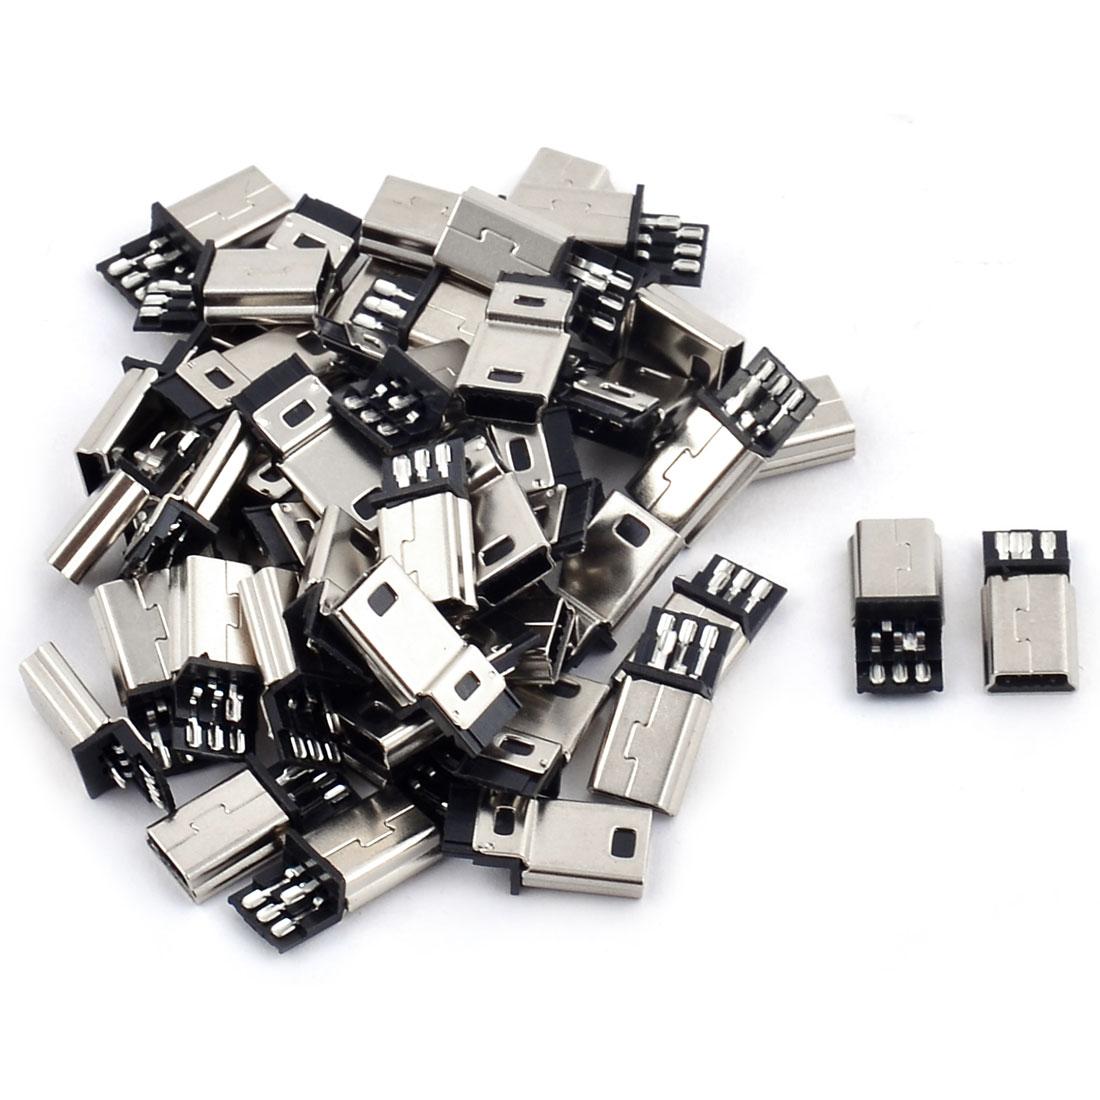 DIY Mini USB 5 Terminal Type B Male Connector Silver Tone 50pcs